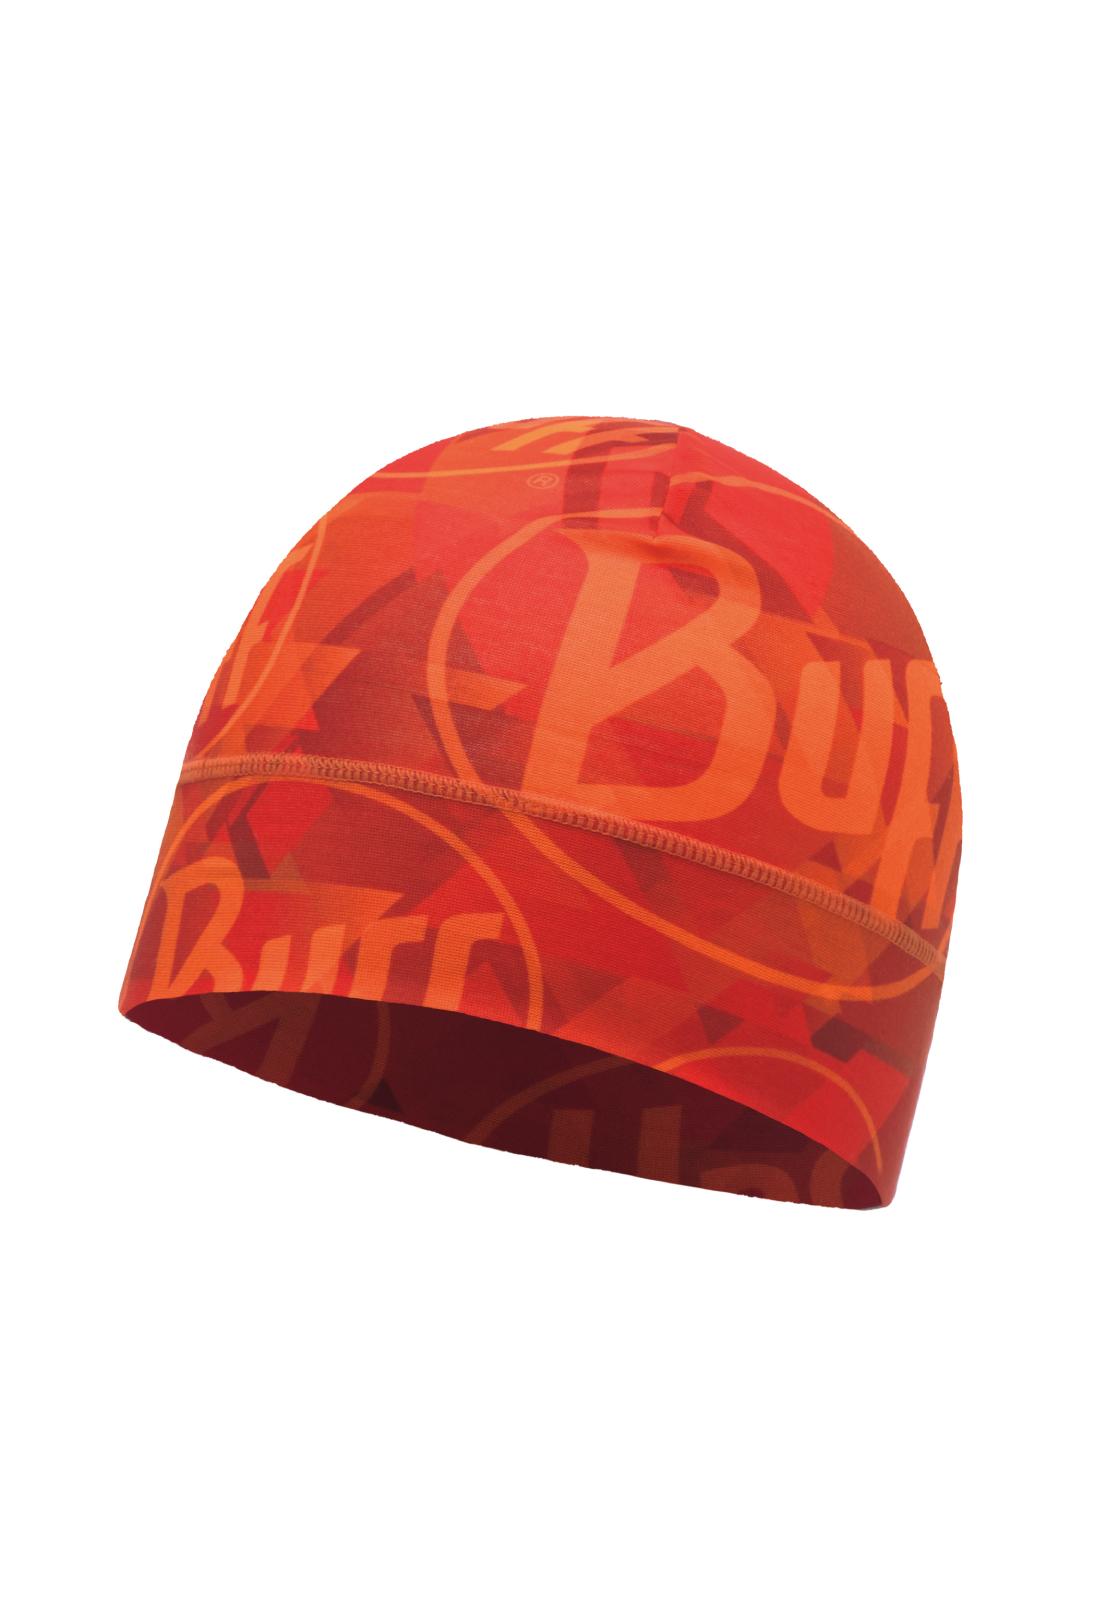 Microfiber 1 Layer Hat Tip Logo Orange Fluor